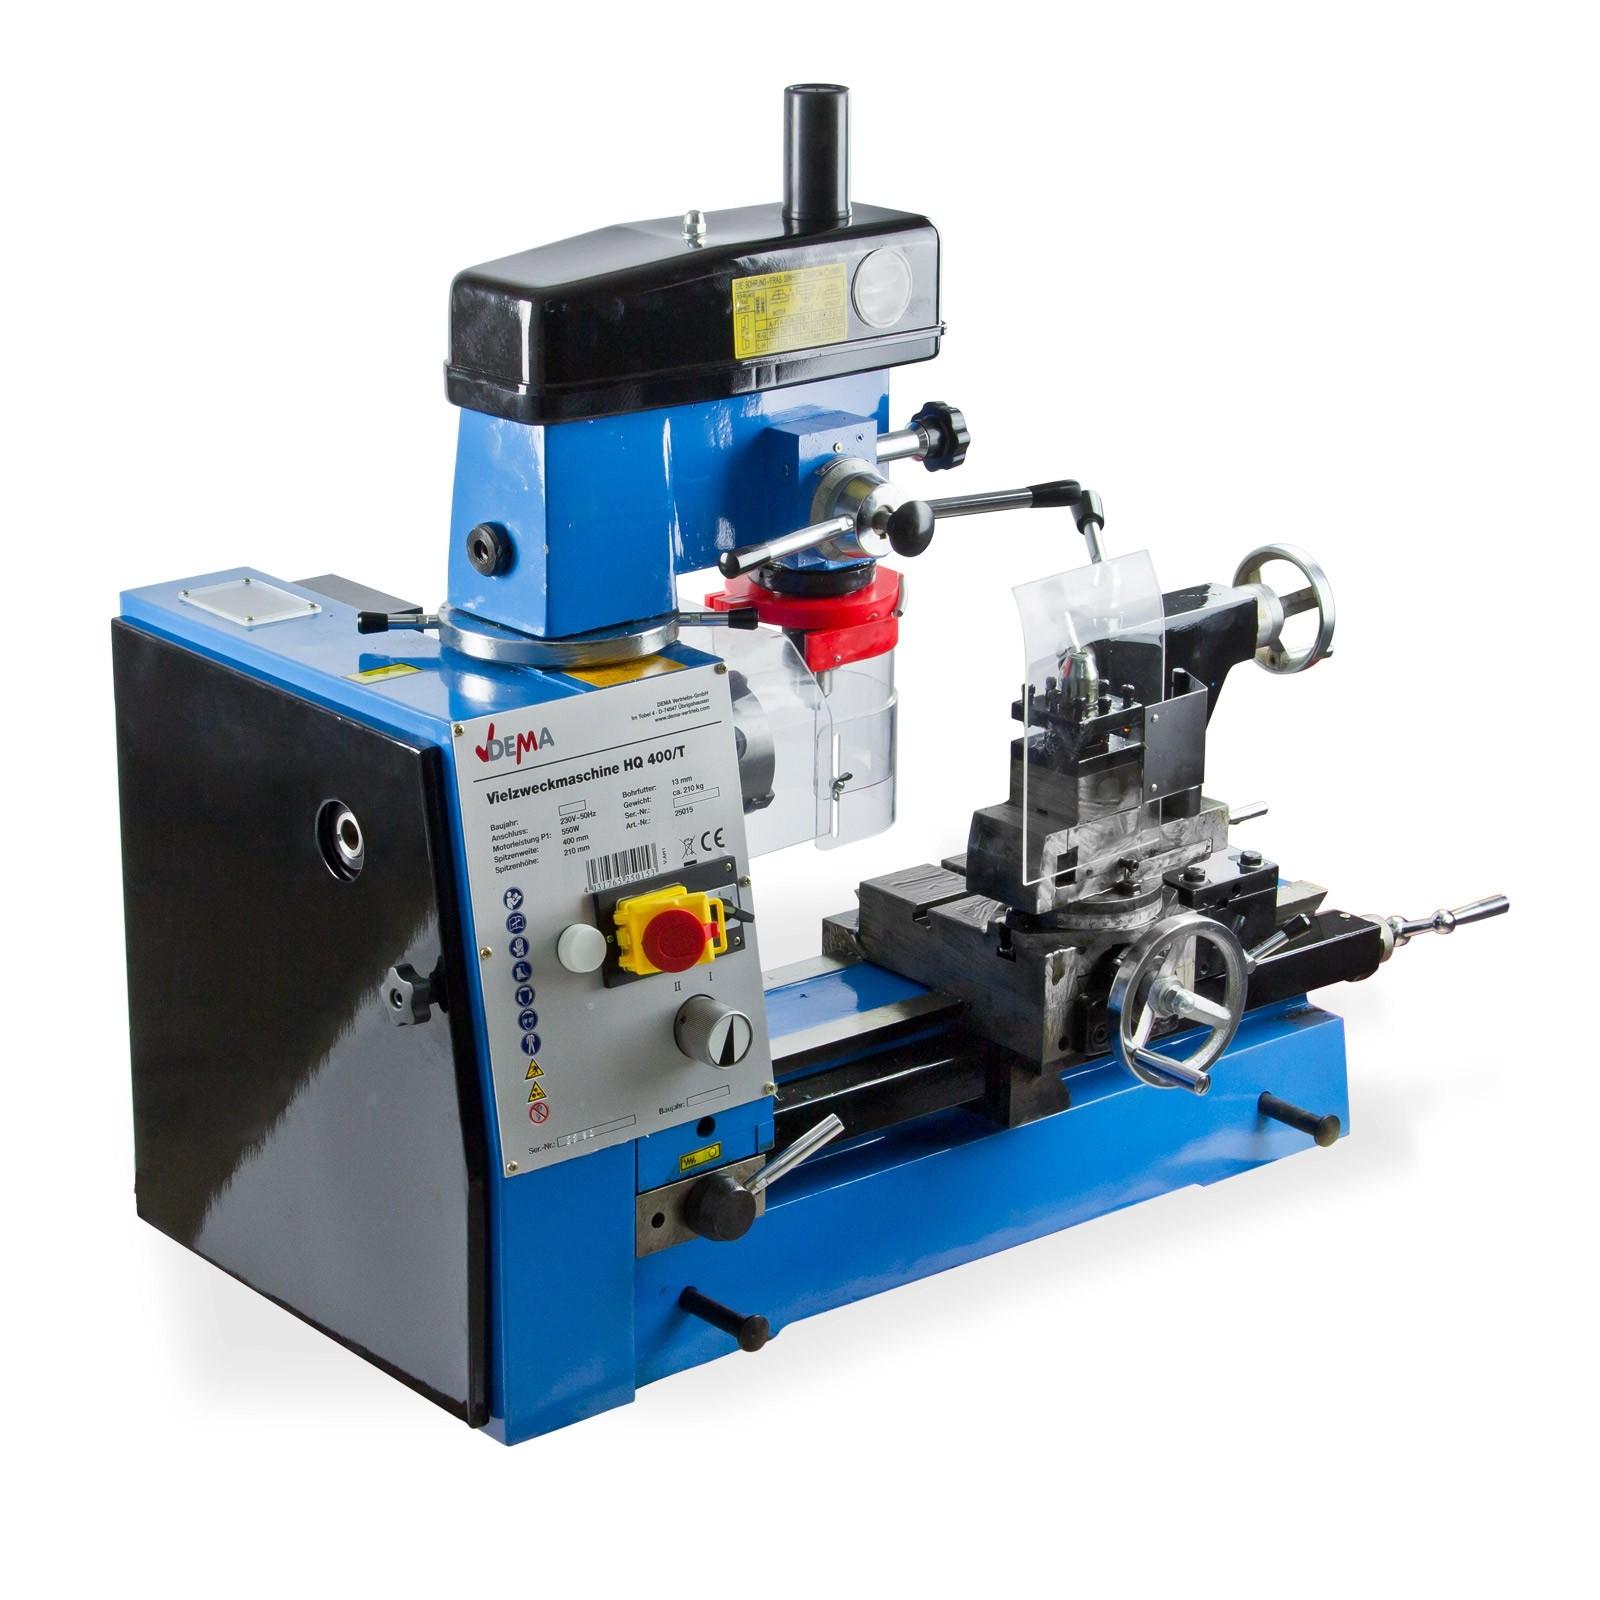 Dema Drehmaschine / Bohrmaschine / Fräsmaschine HQ400/T 25015